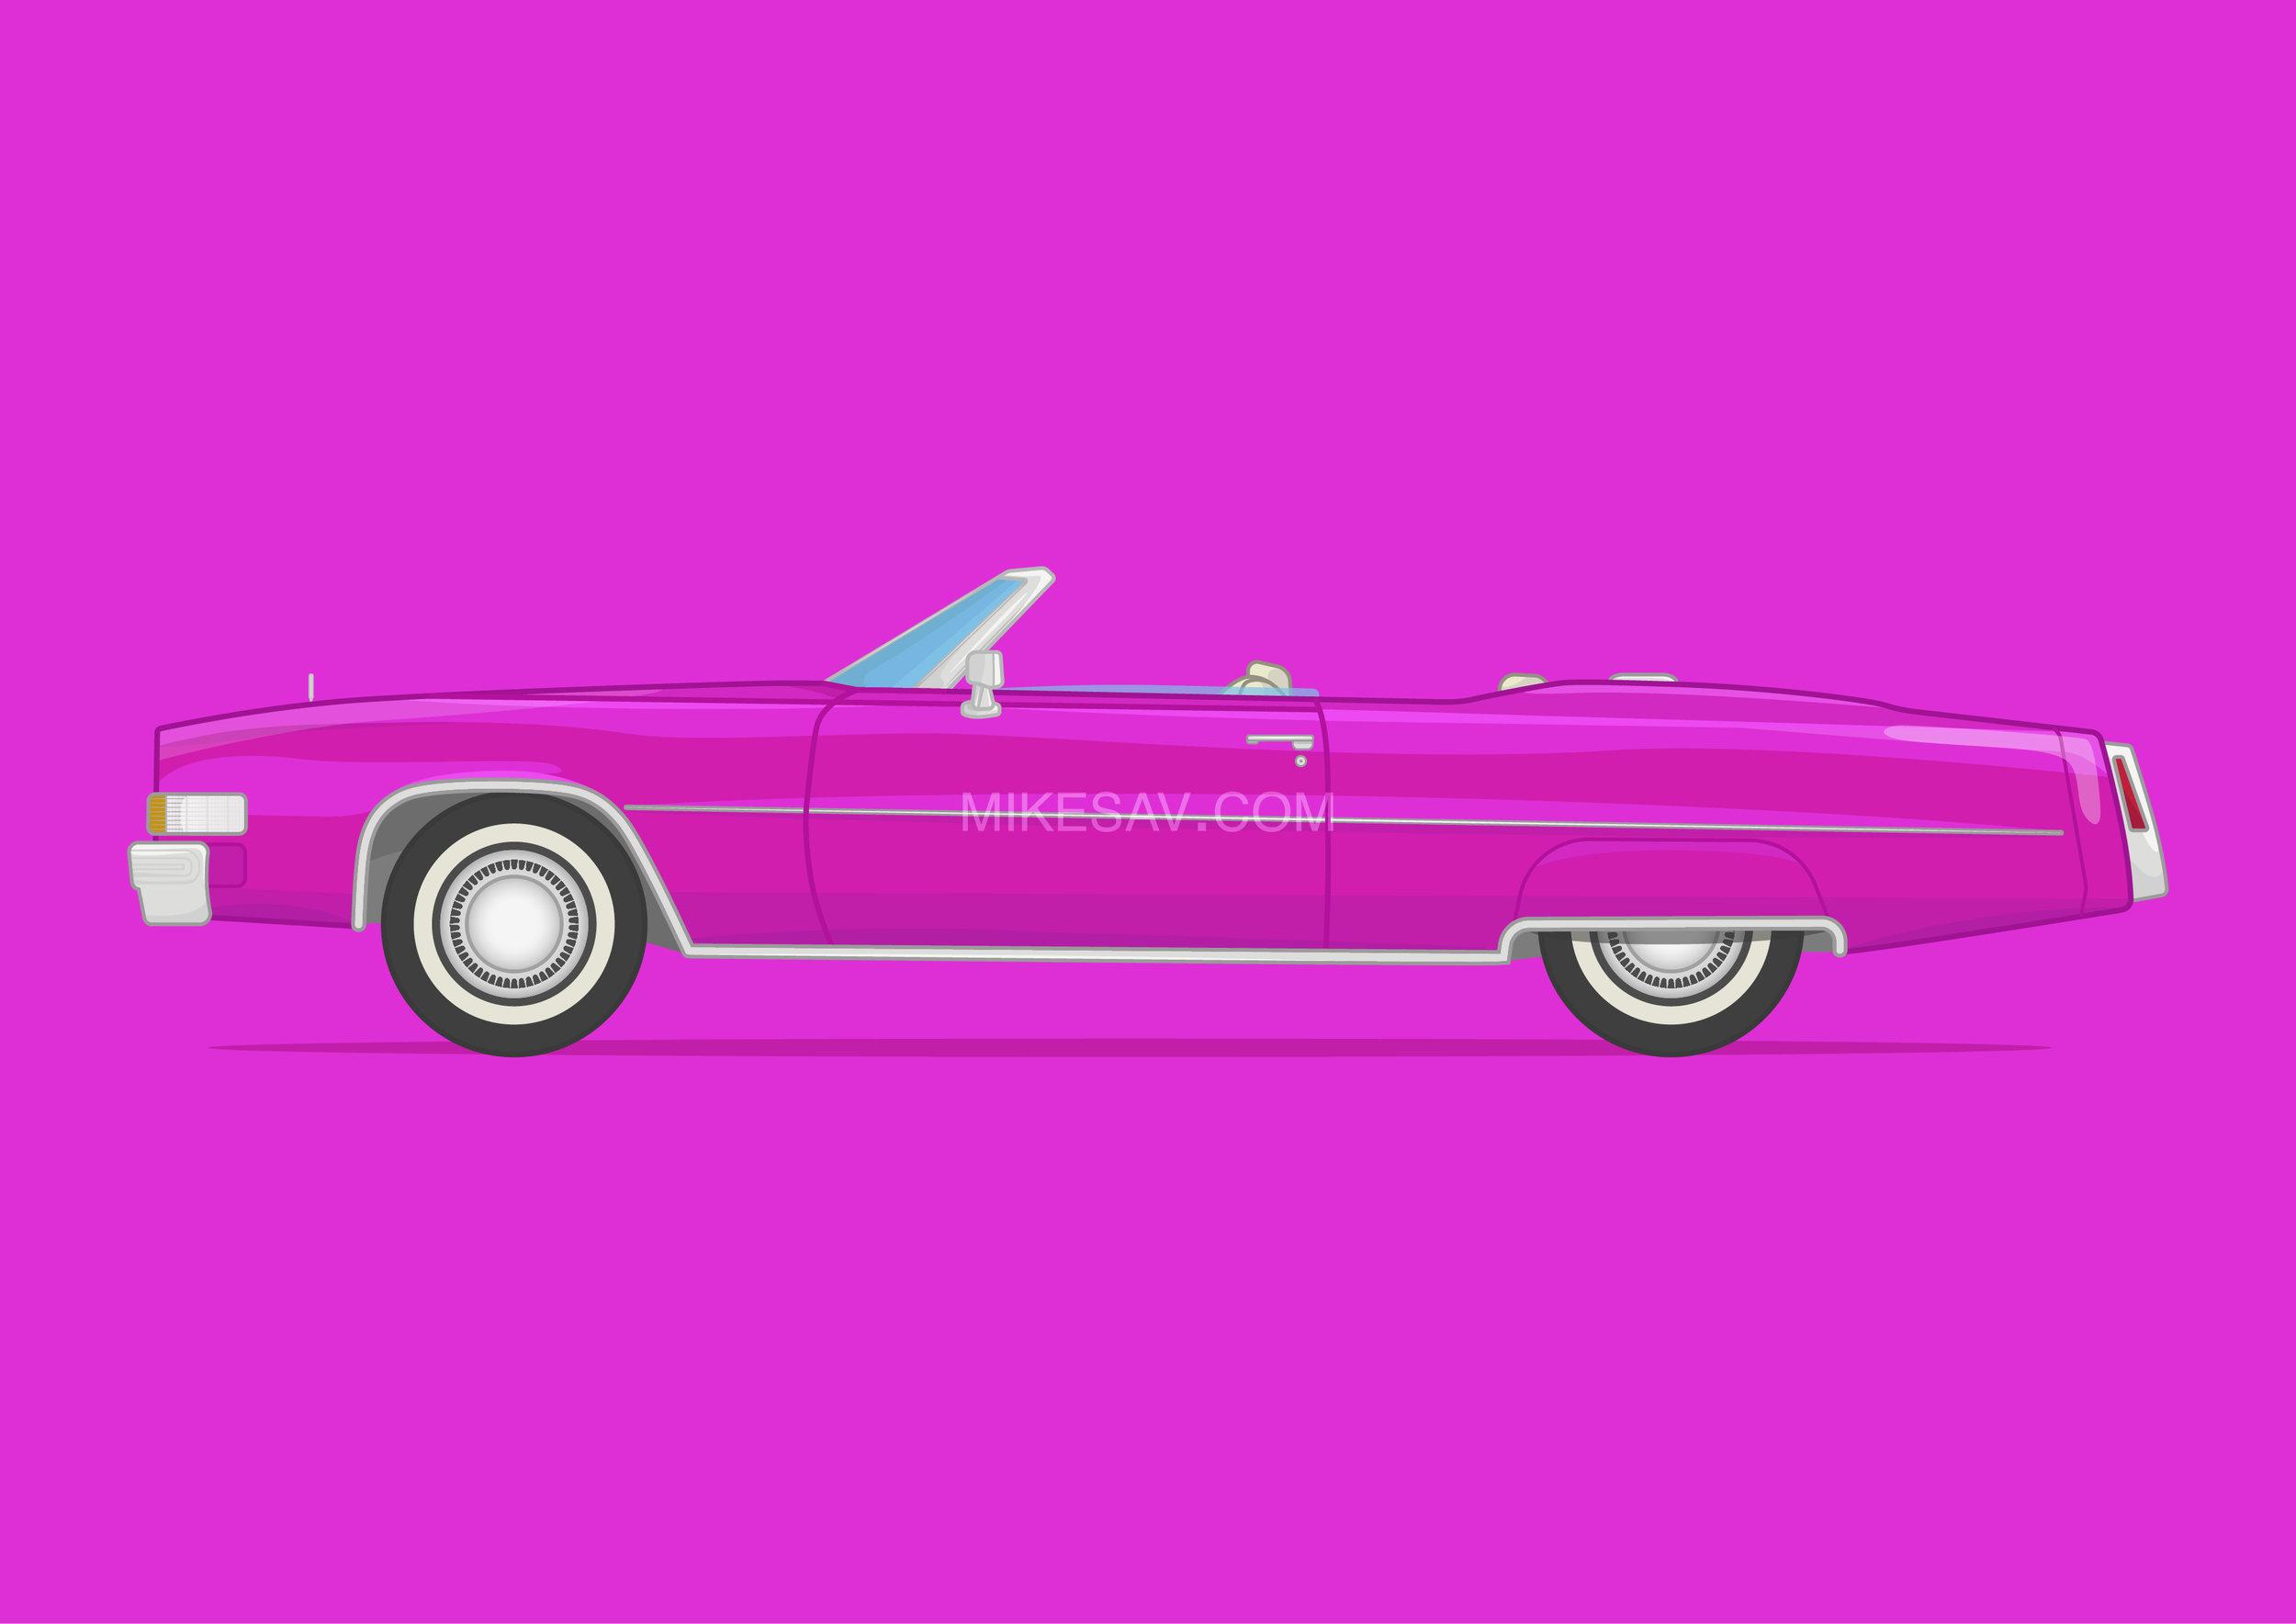 Cadillac Fleetwood Eldorado / True Romance (1993) / Director: Tony Scott